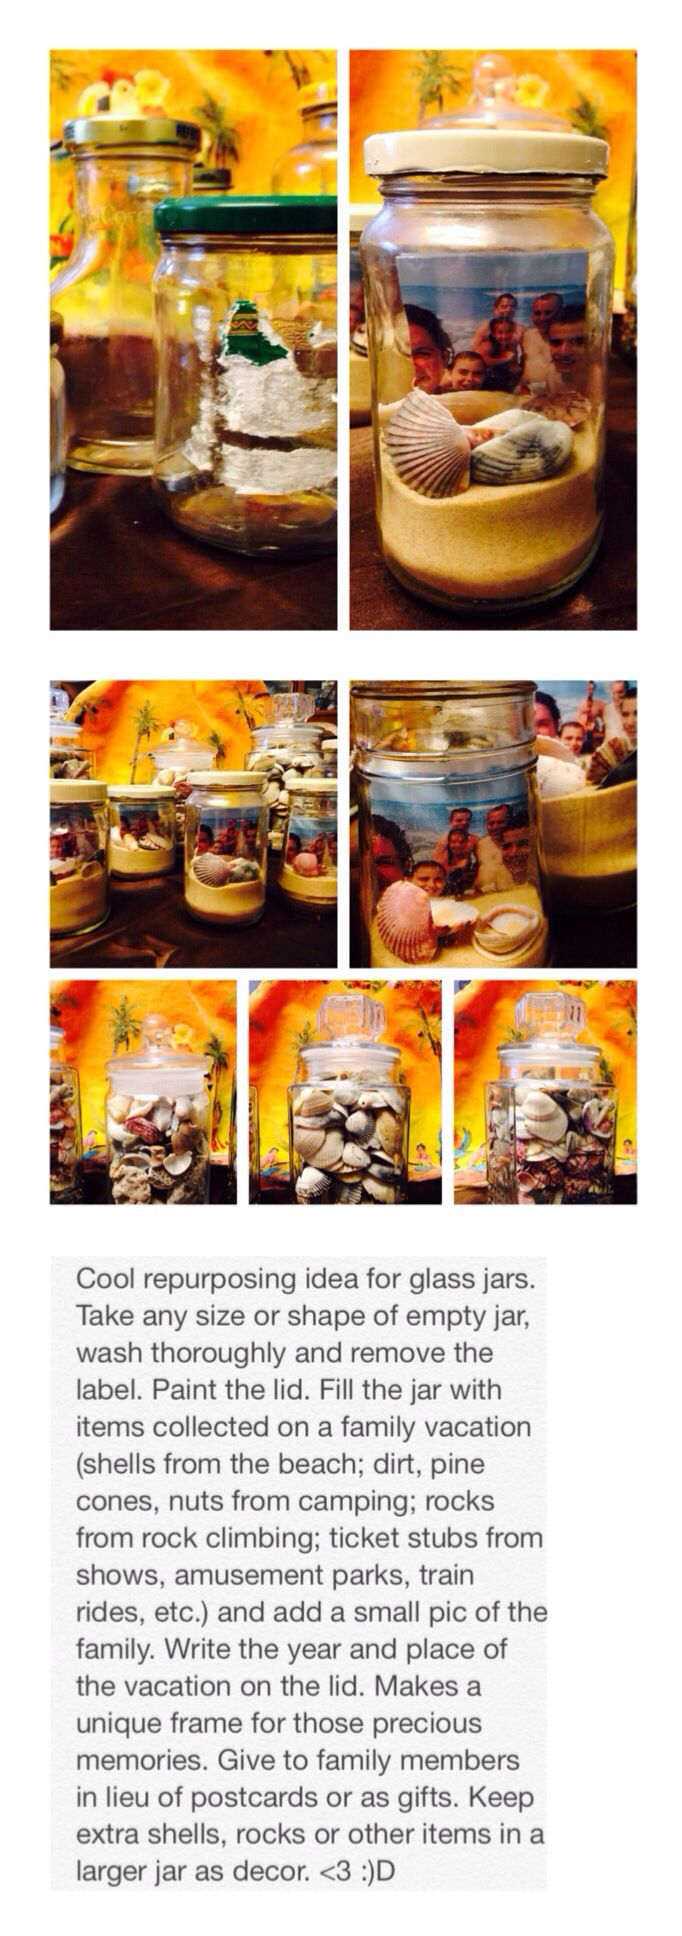 Repurposing glass jars. Great decor or gift idea. <3 :)D